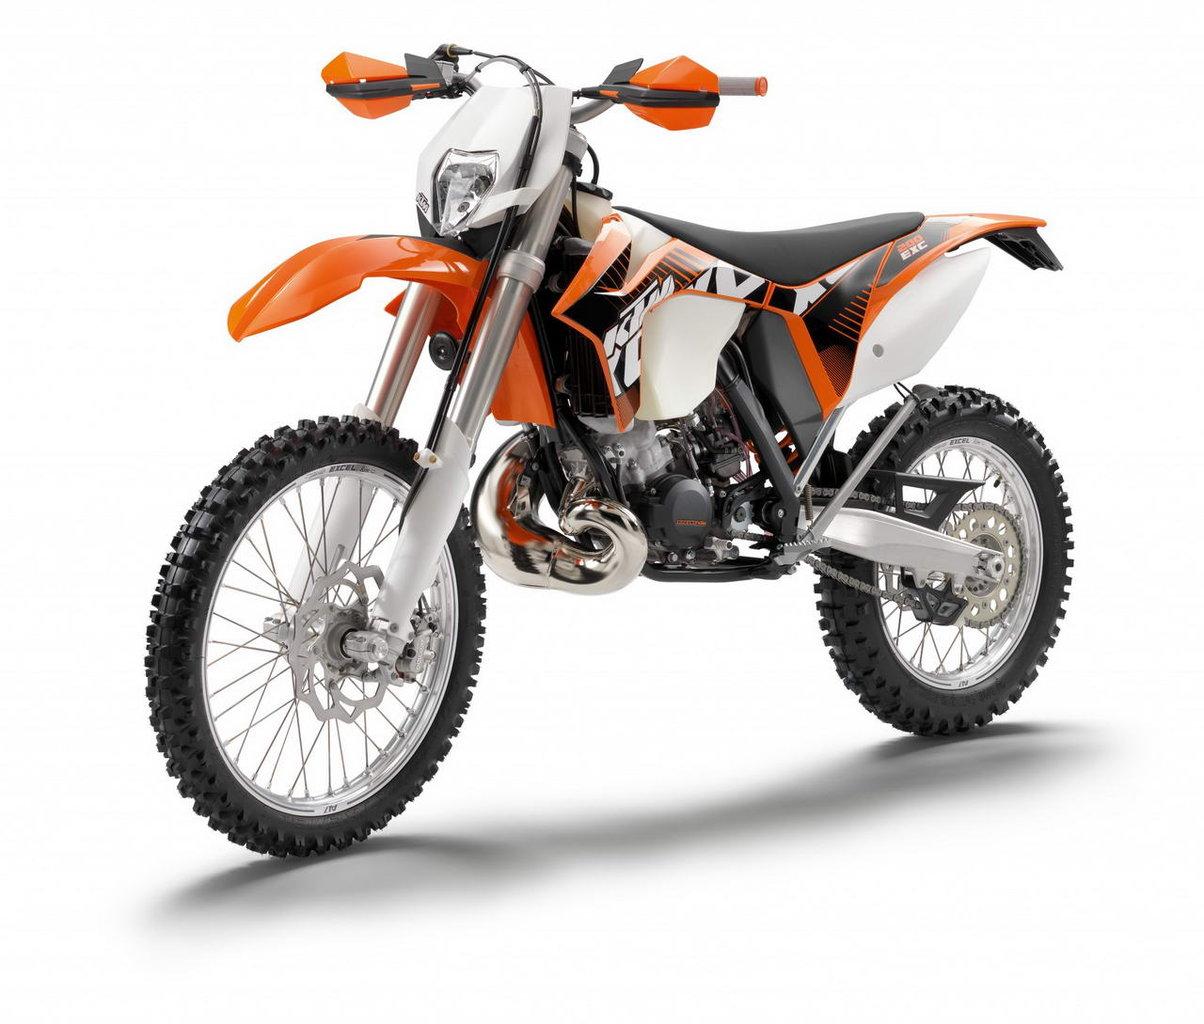 Listino Ktm EXC-F 250 SIX DAYS Fuoristrada - image 14811_ktm-exc-f250-six-days on http://moto.motori.net